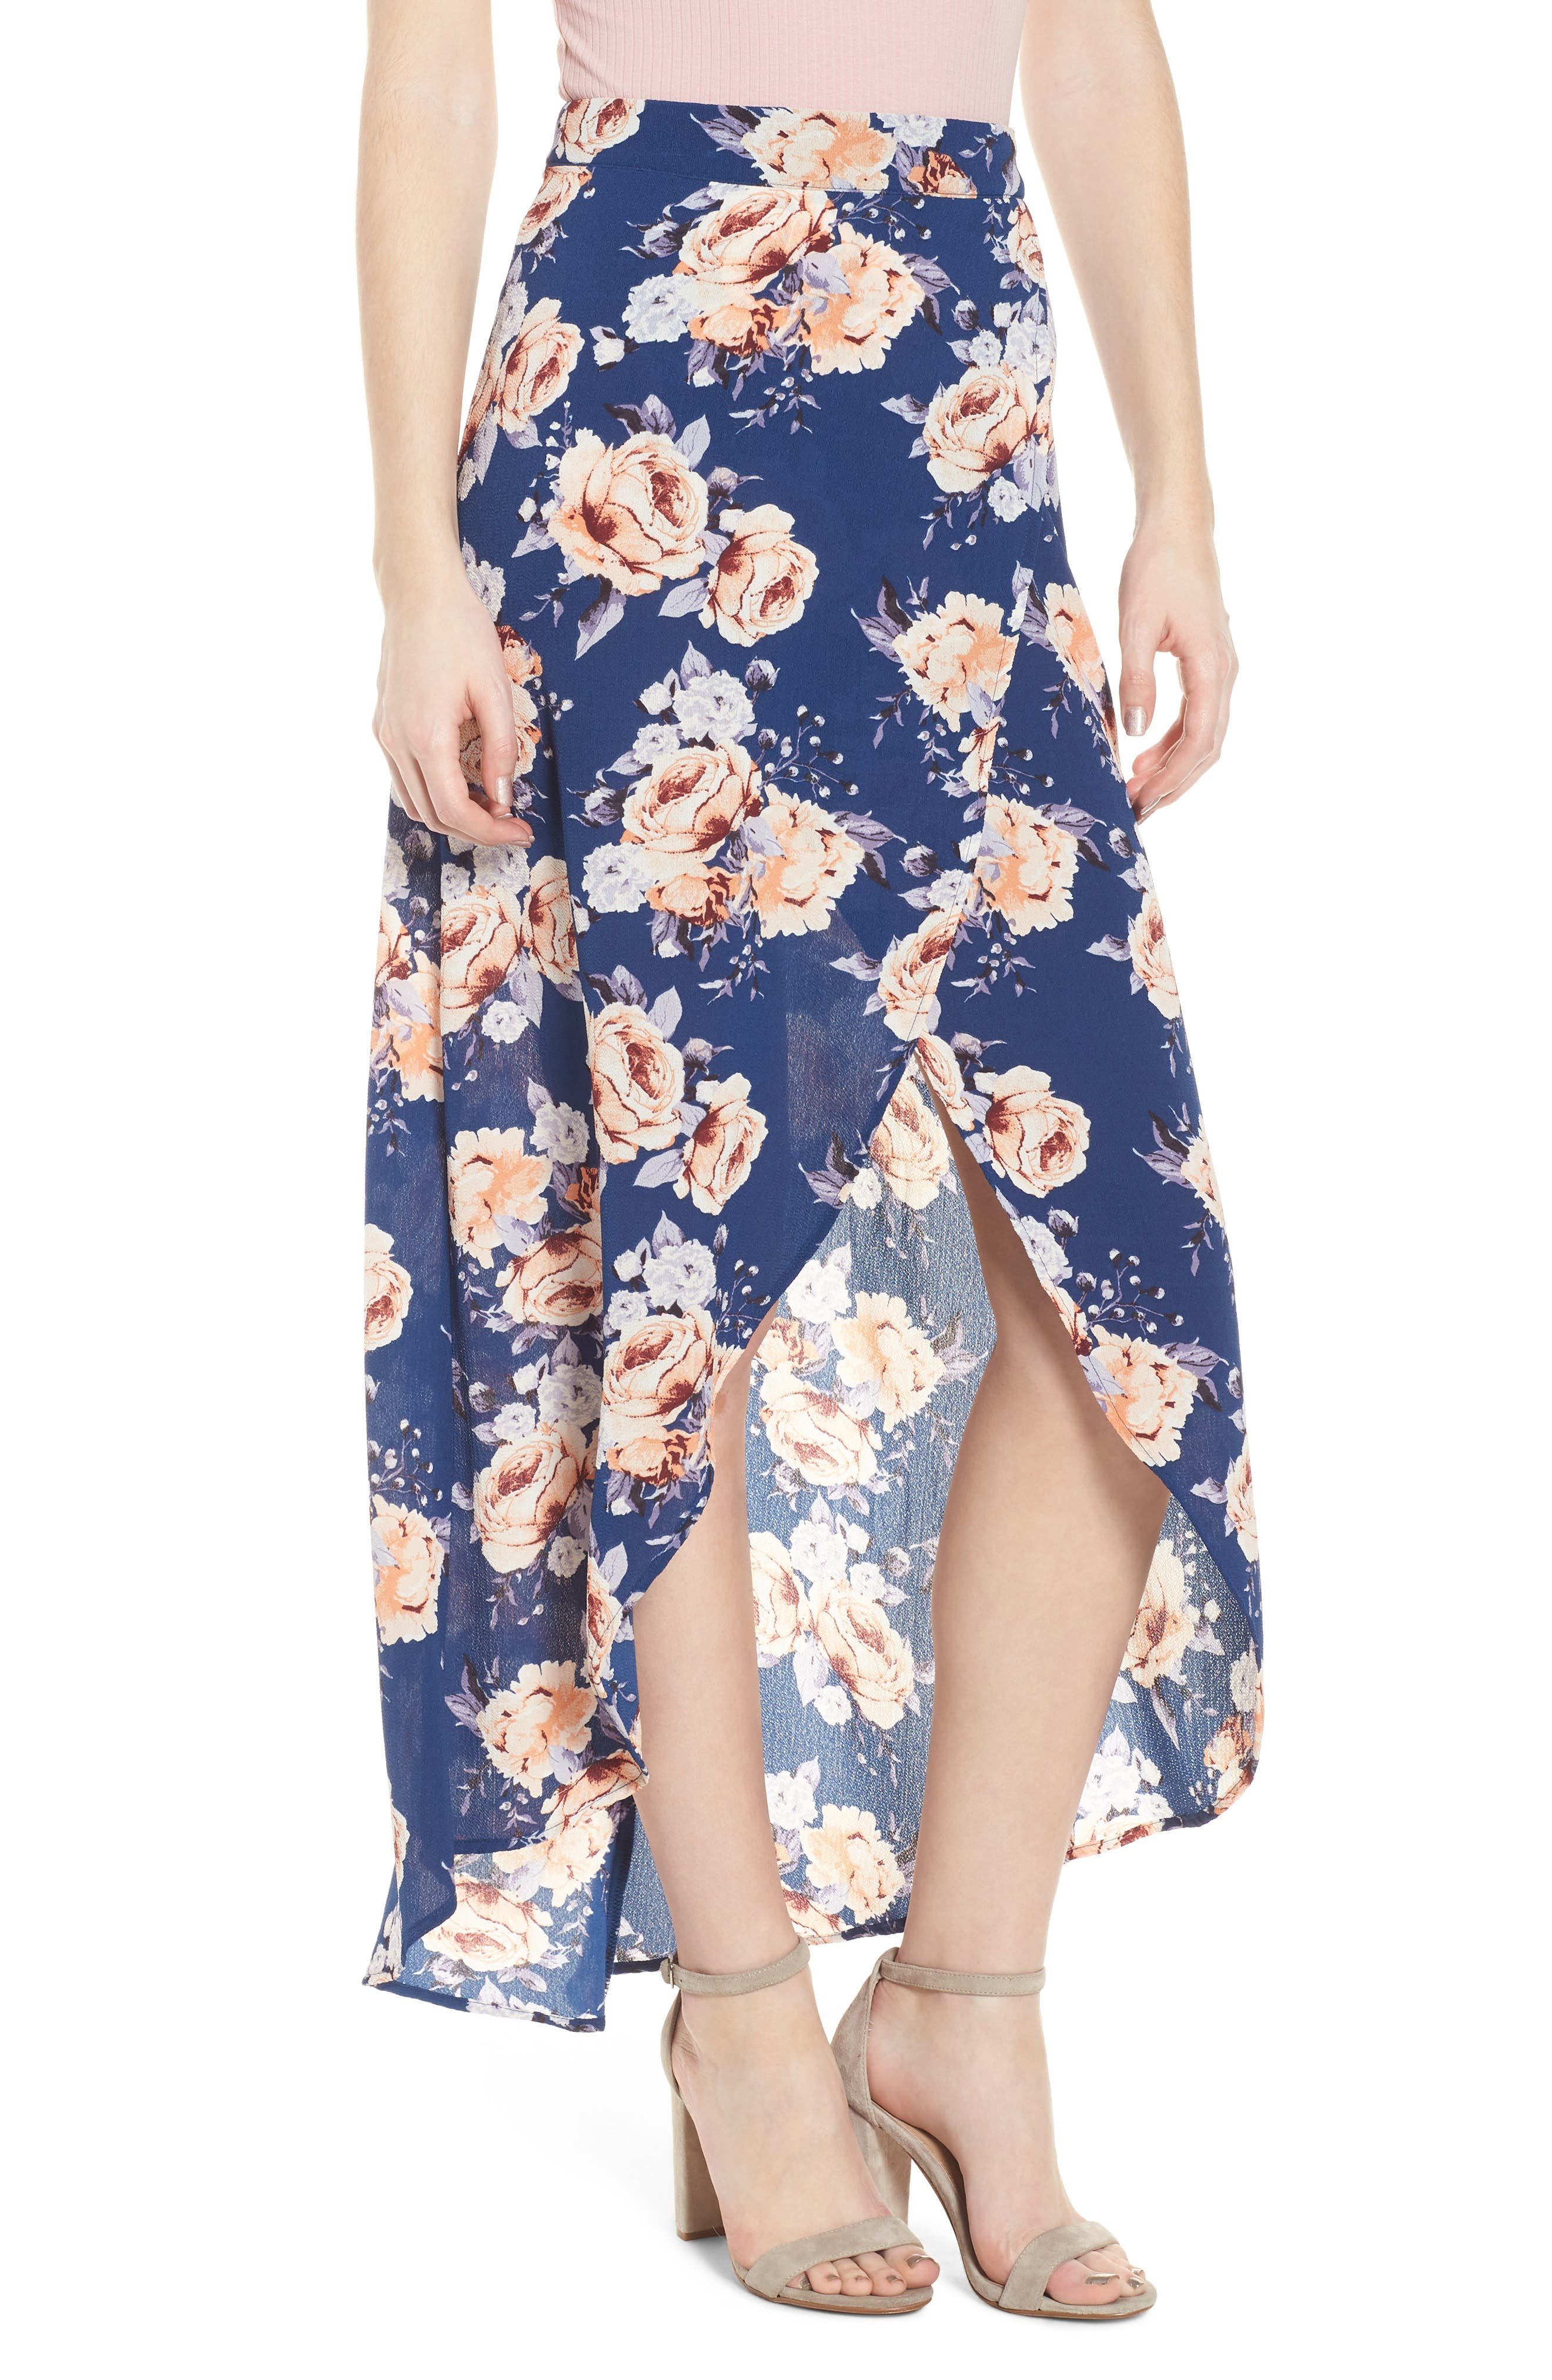 Mimi Chica Floral Print Maxi Skirt, Blue